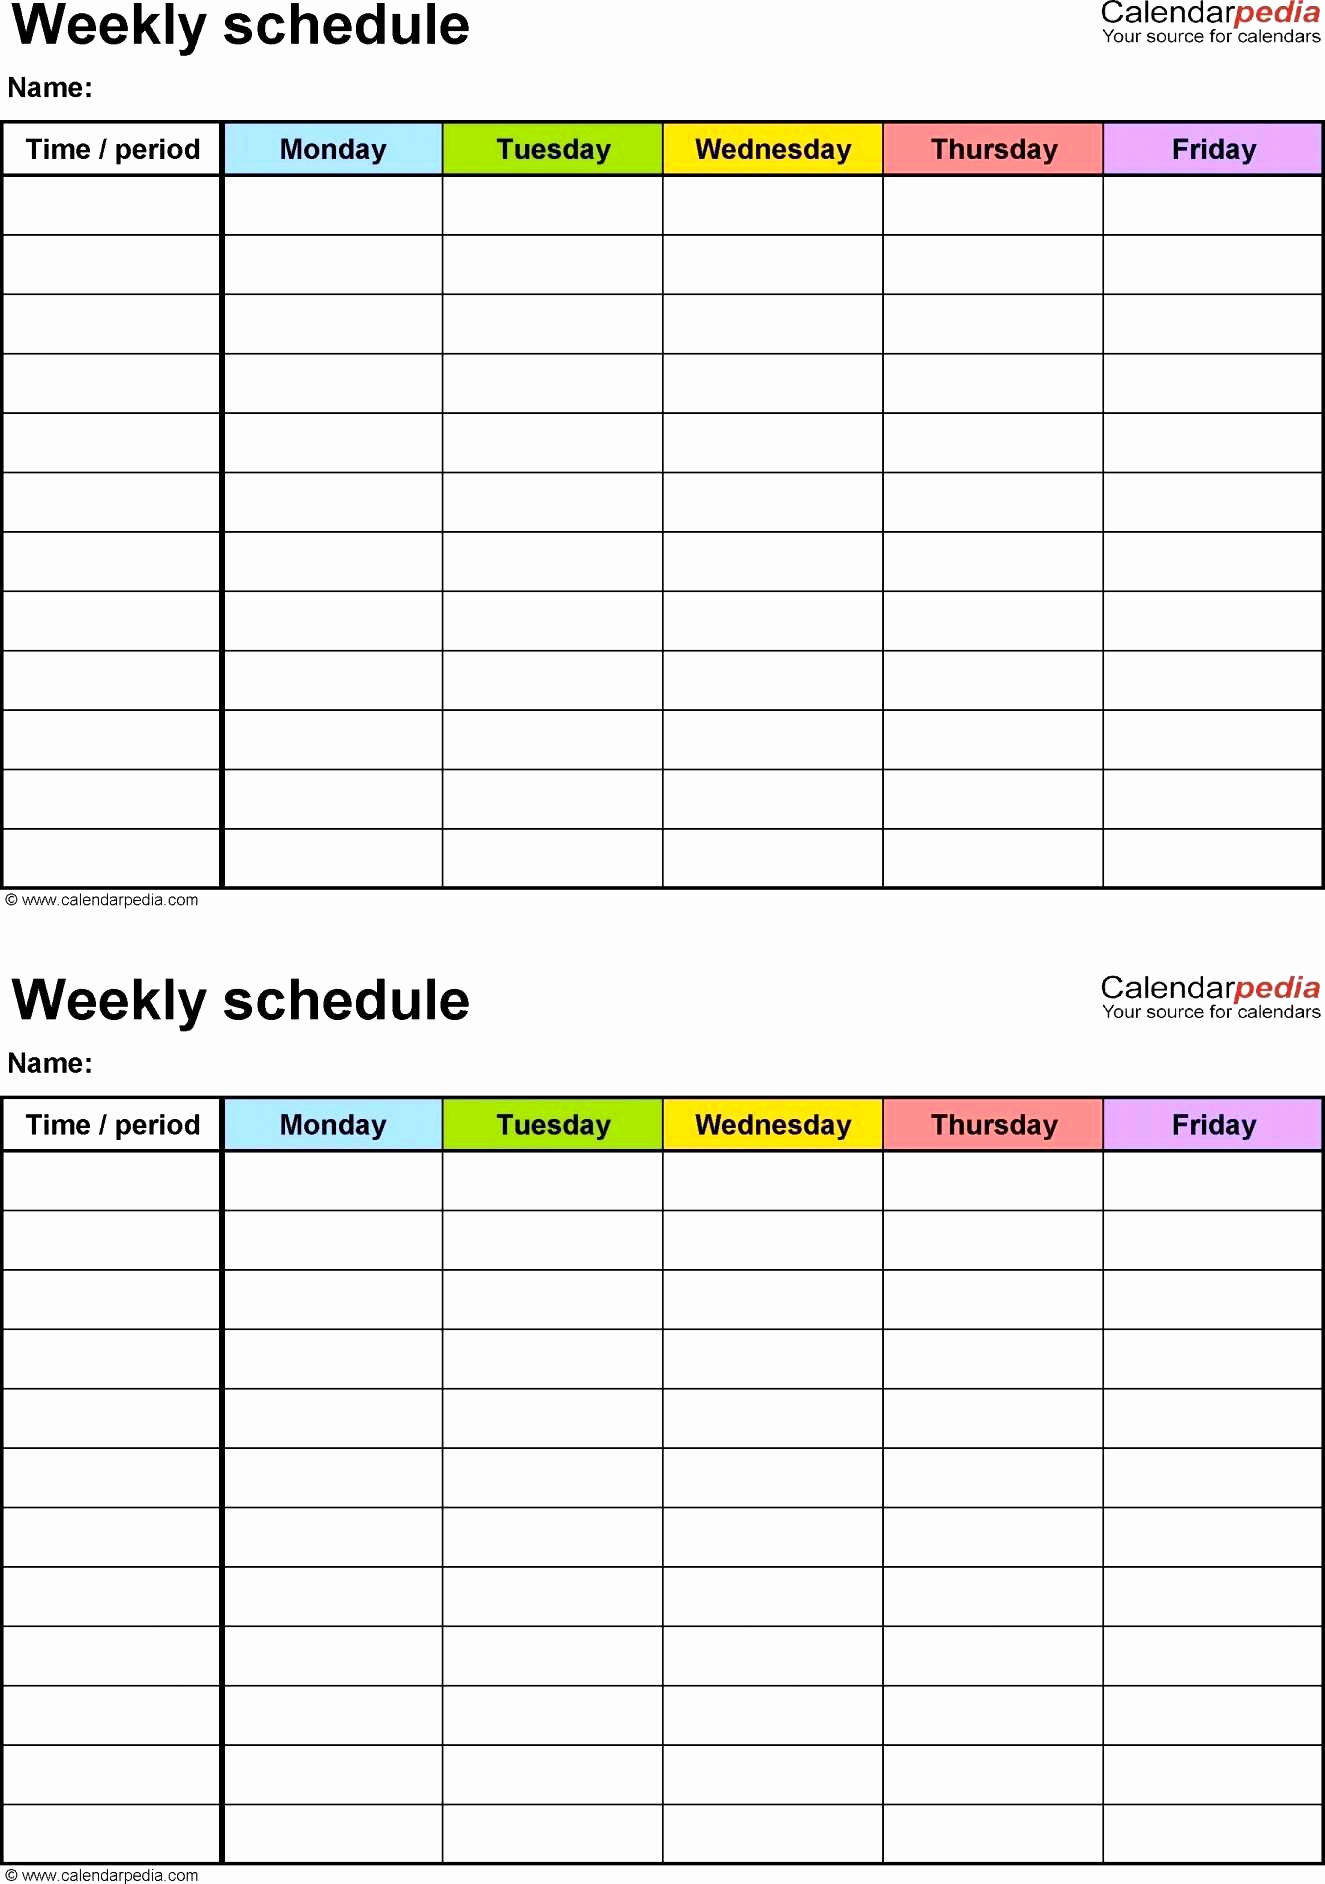 Ebay Spreadsheet For Ebay Inventory Spreadsheet Free Template Excel Invoice Best